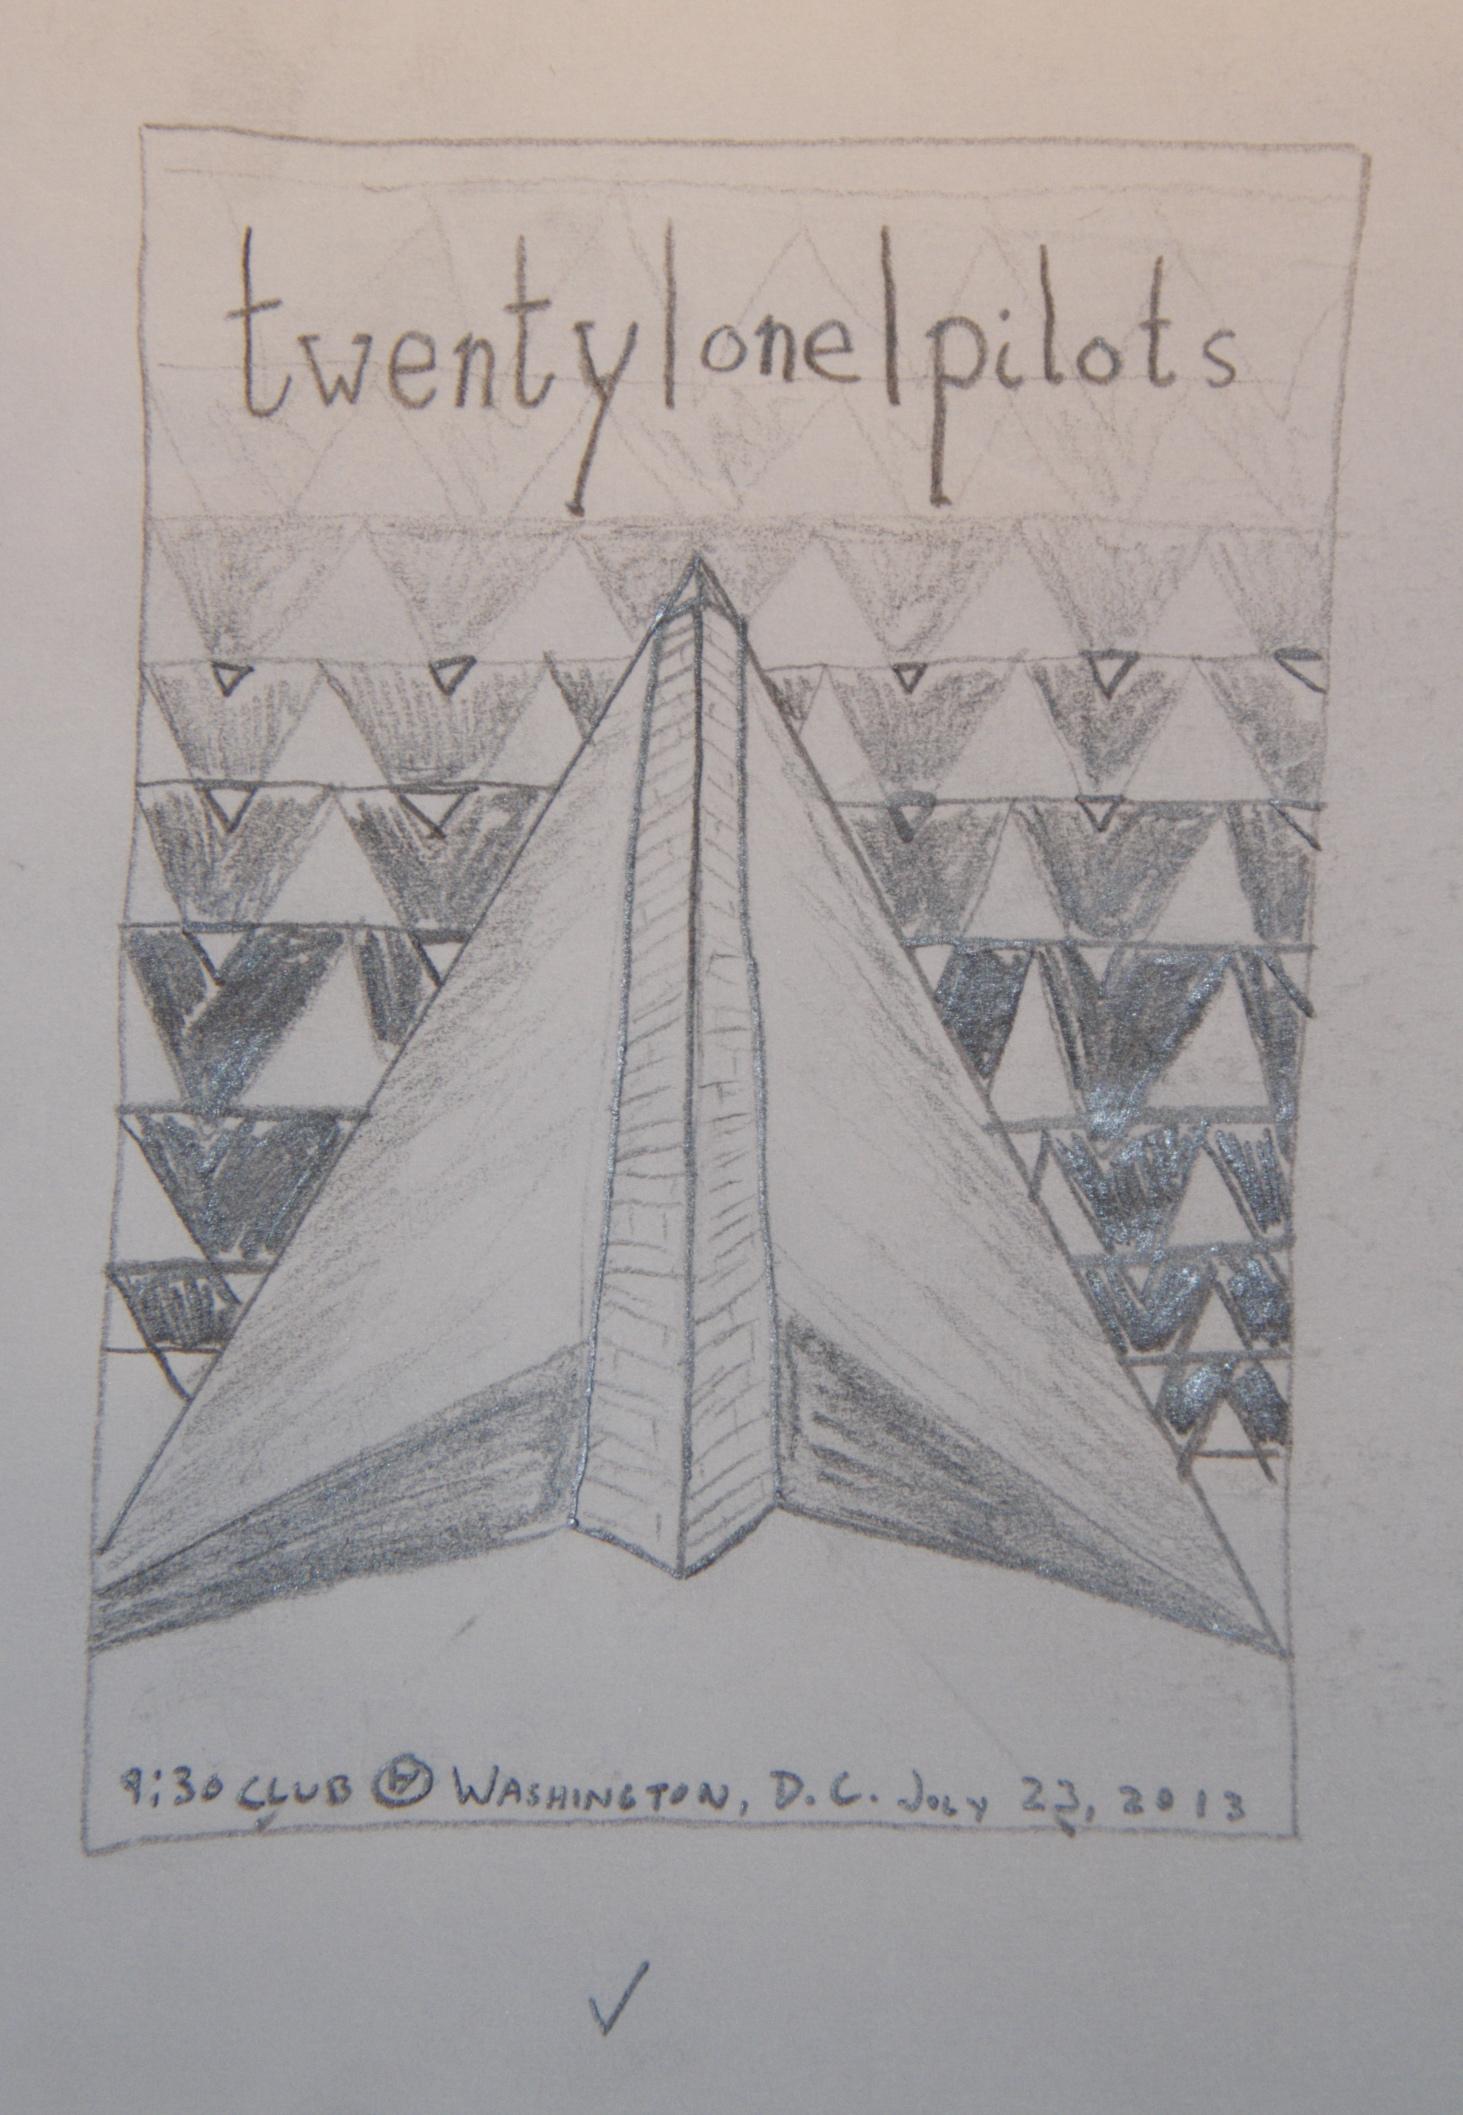 twenty | one | pilots - image 8 - student project